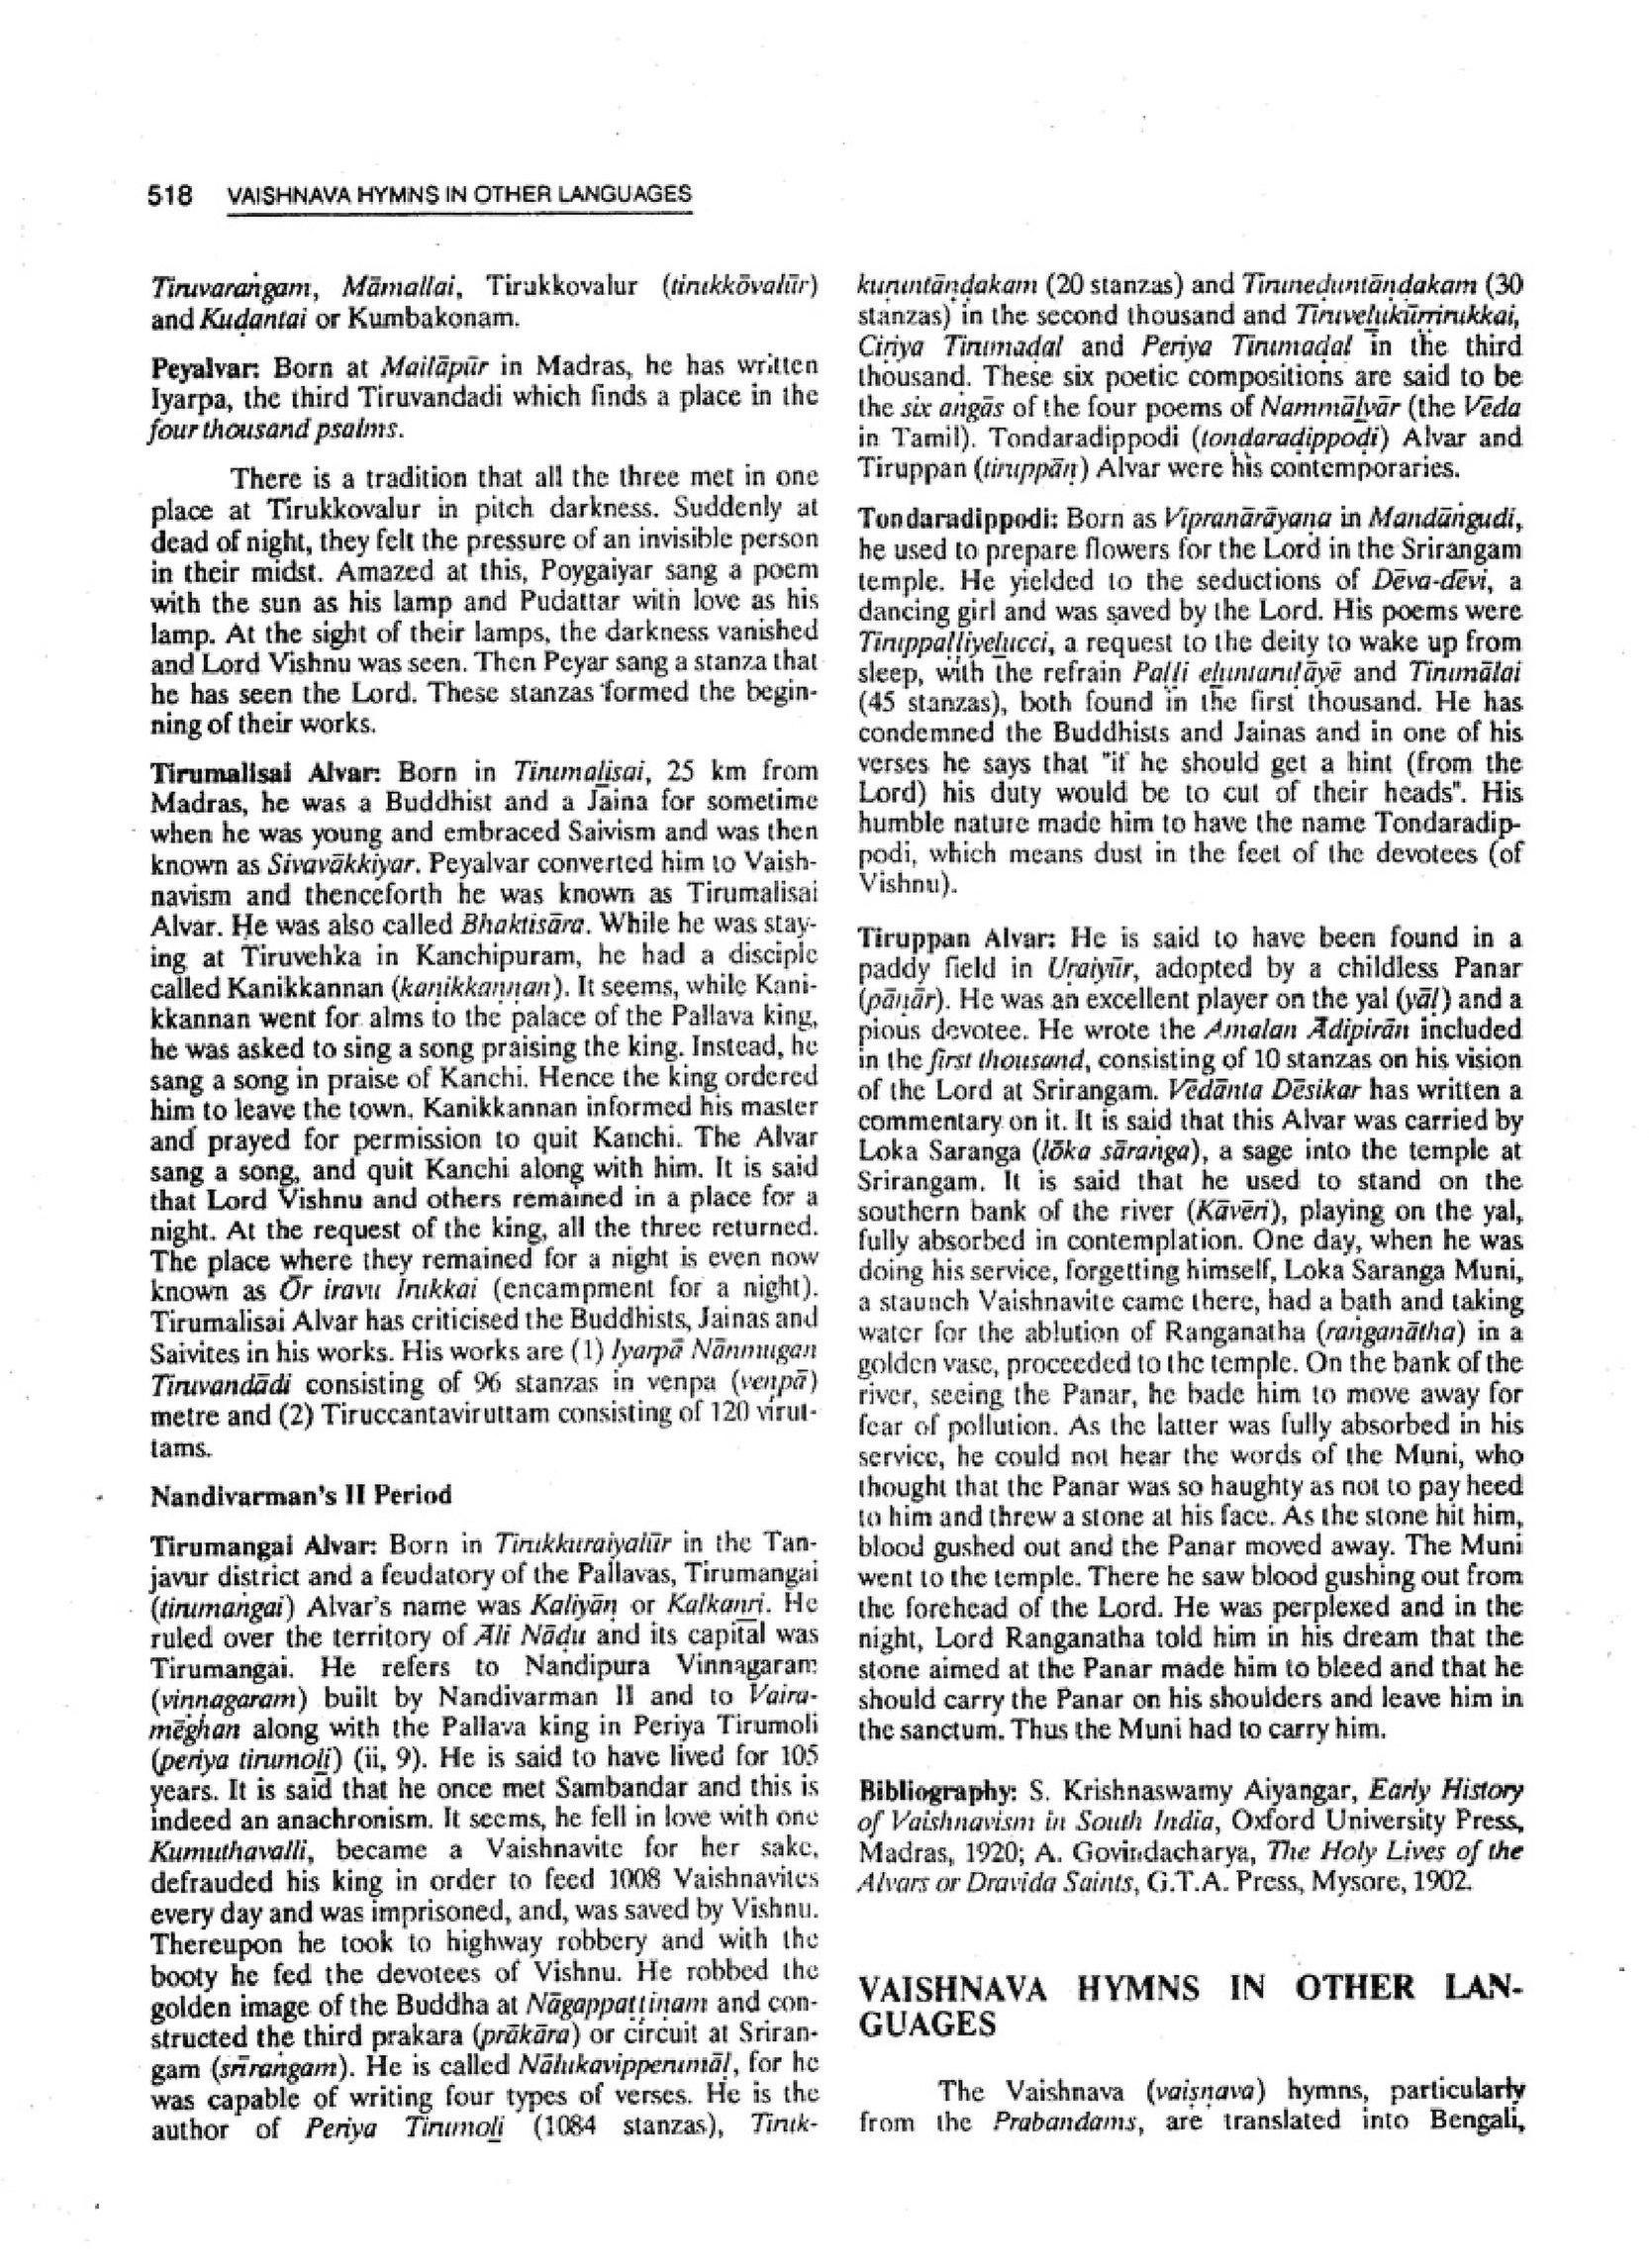 das kapital book in tamil pdf